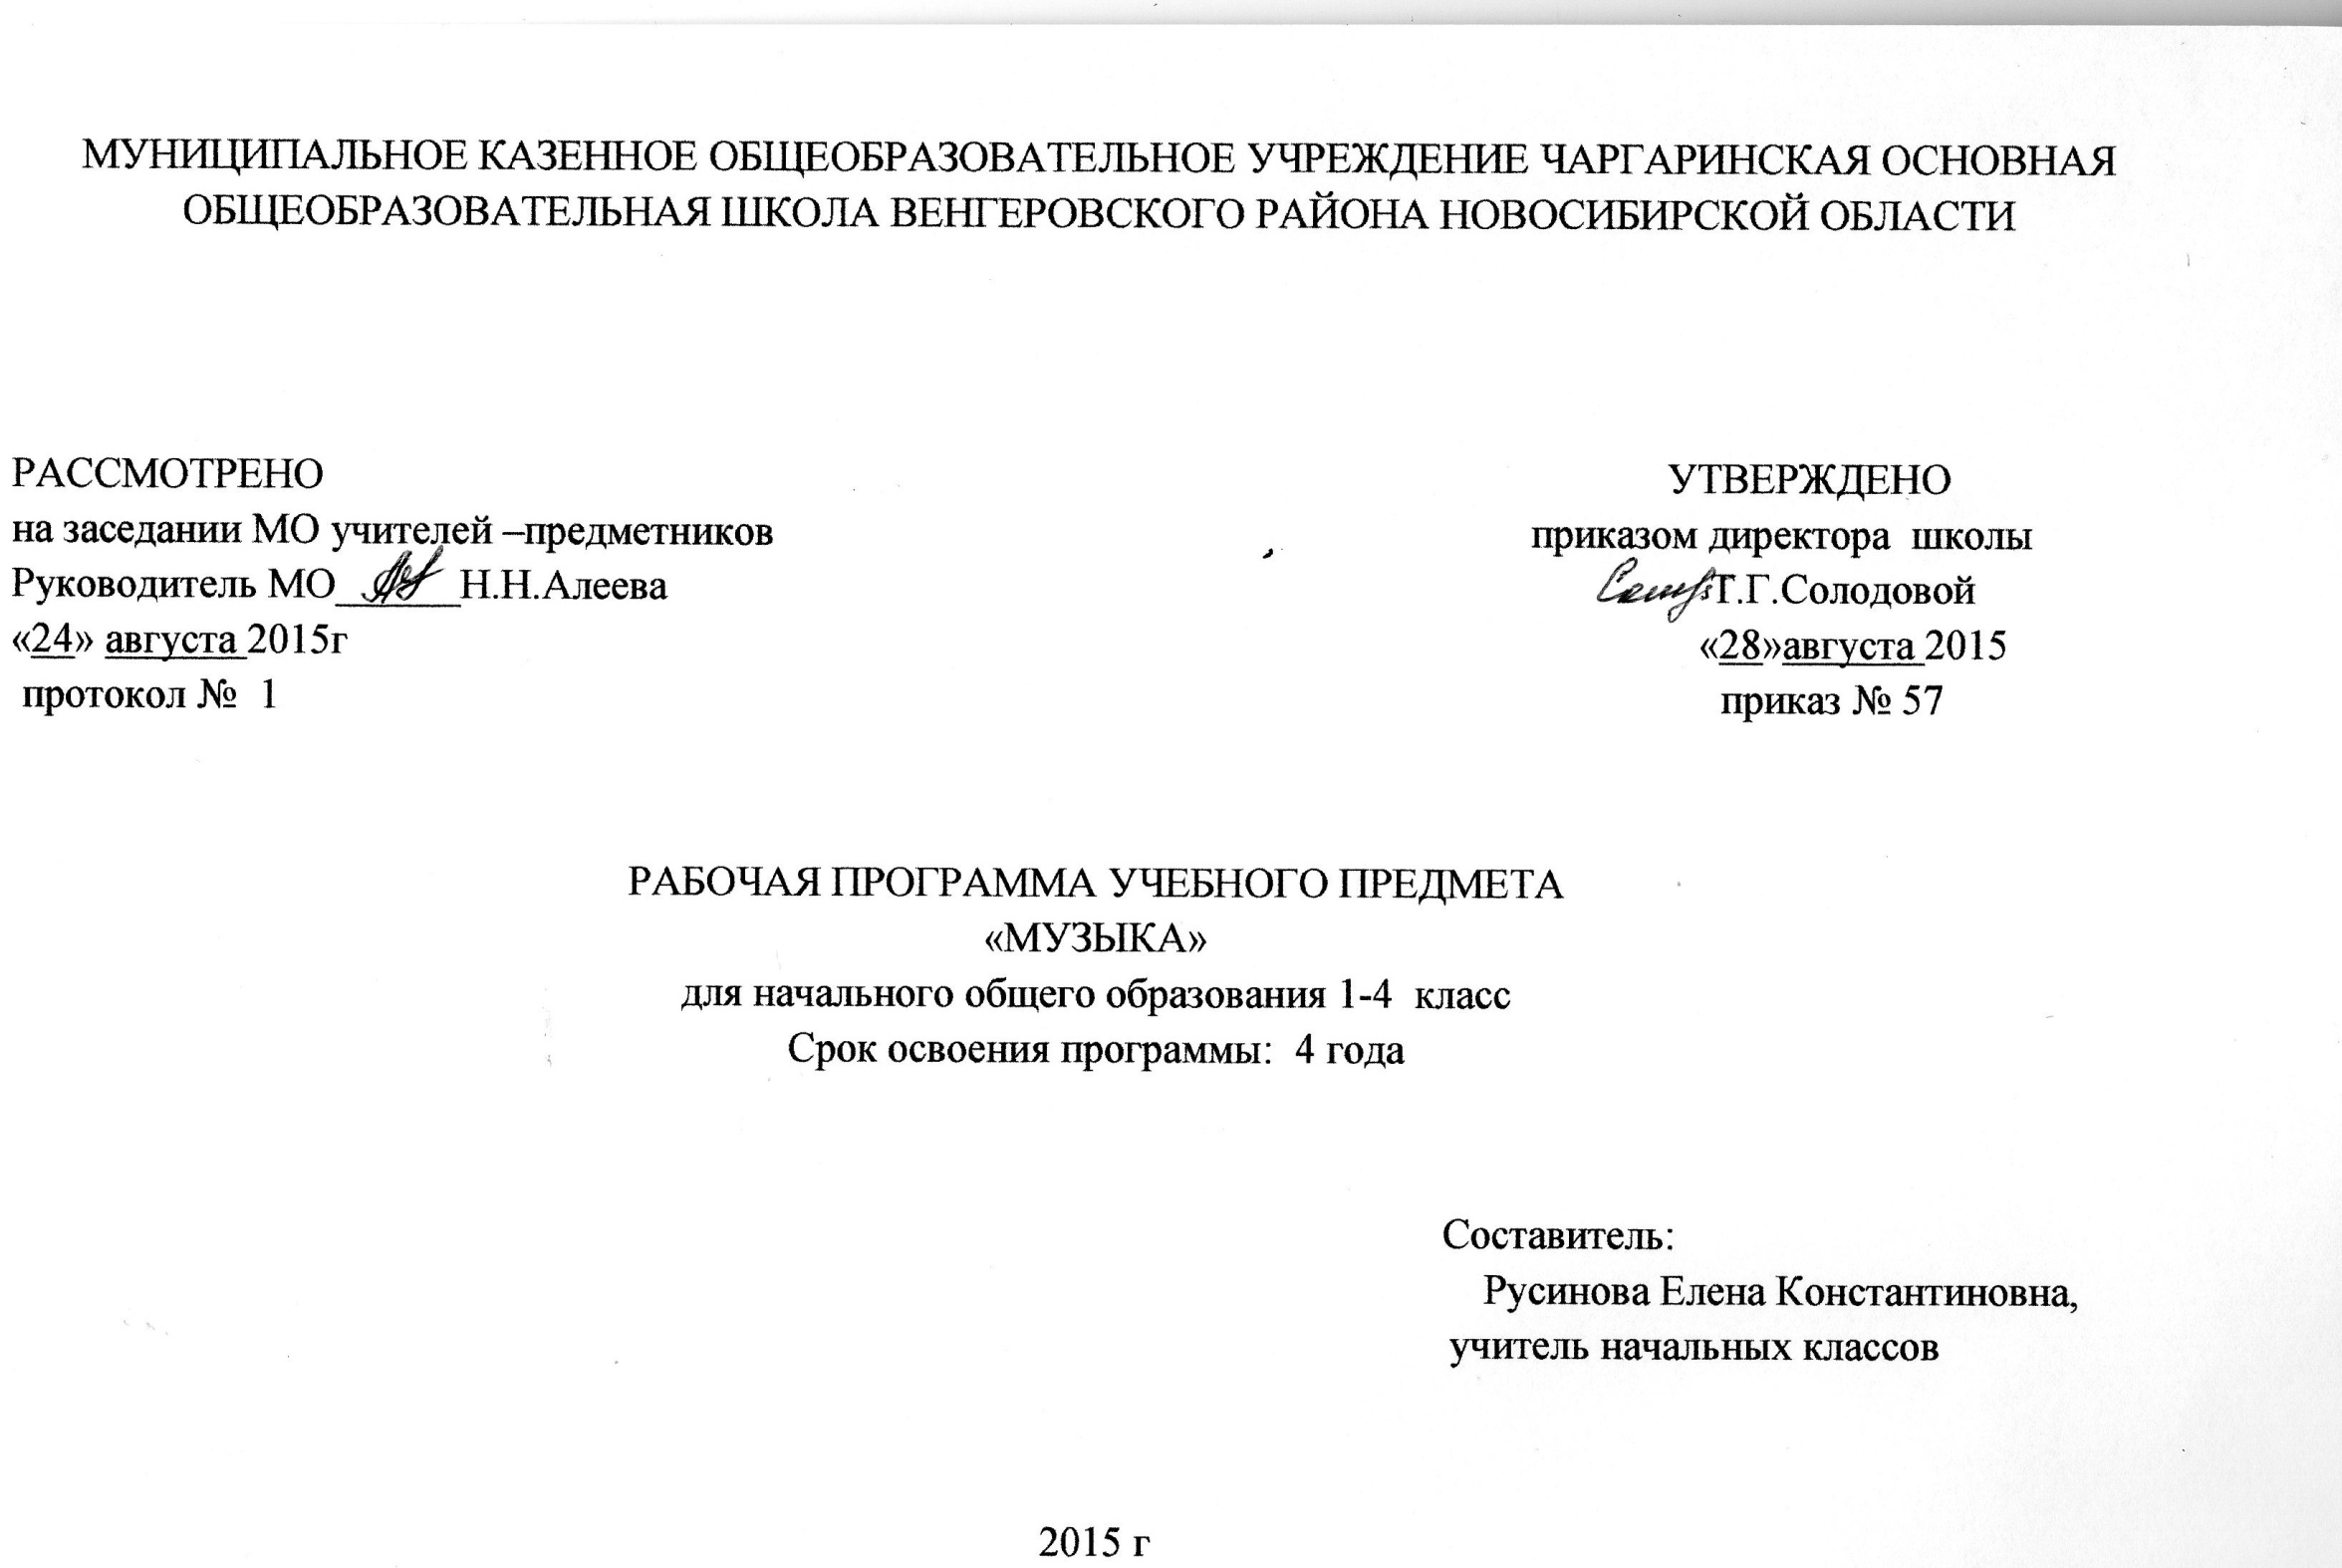 C:\Documents and Settings\Admin\Рабочий стол\img190.jpg